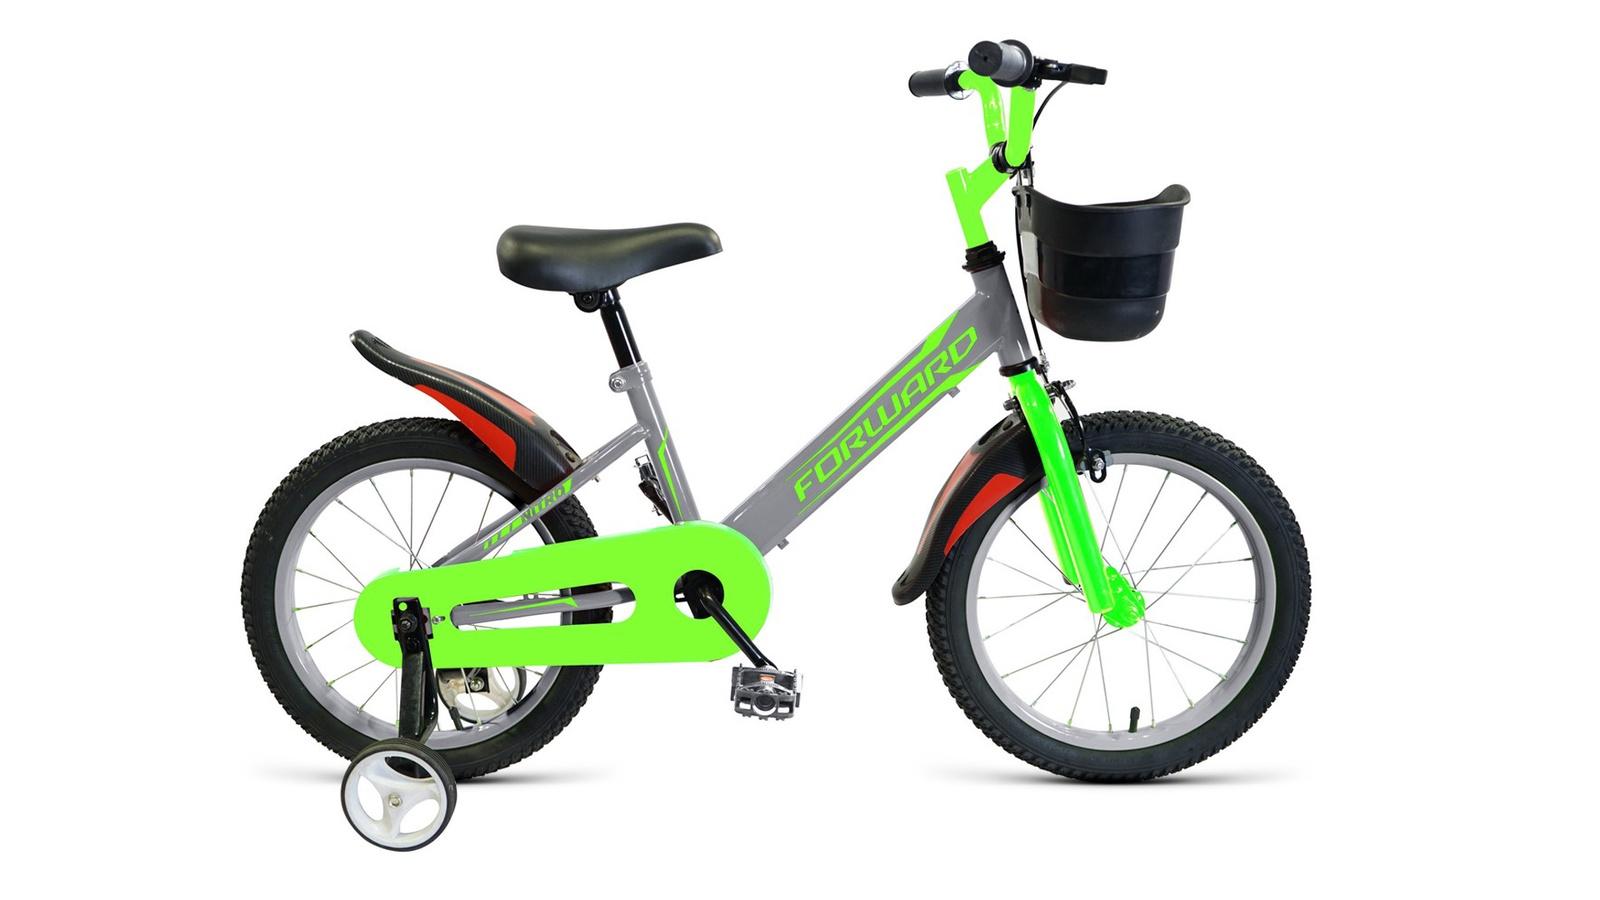 Велосипед Forward Nitro 16 2019 серый велосипед forward nitro 14 2019